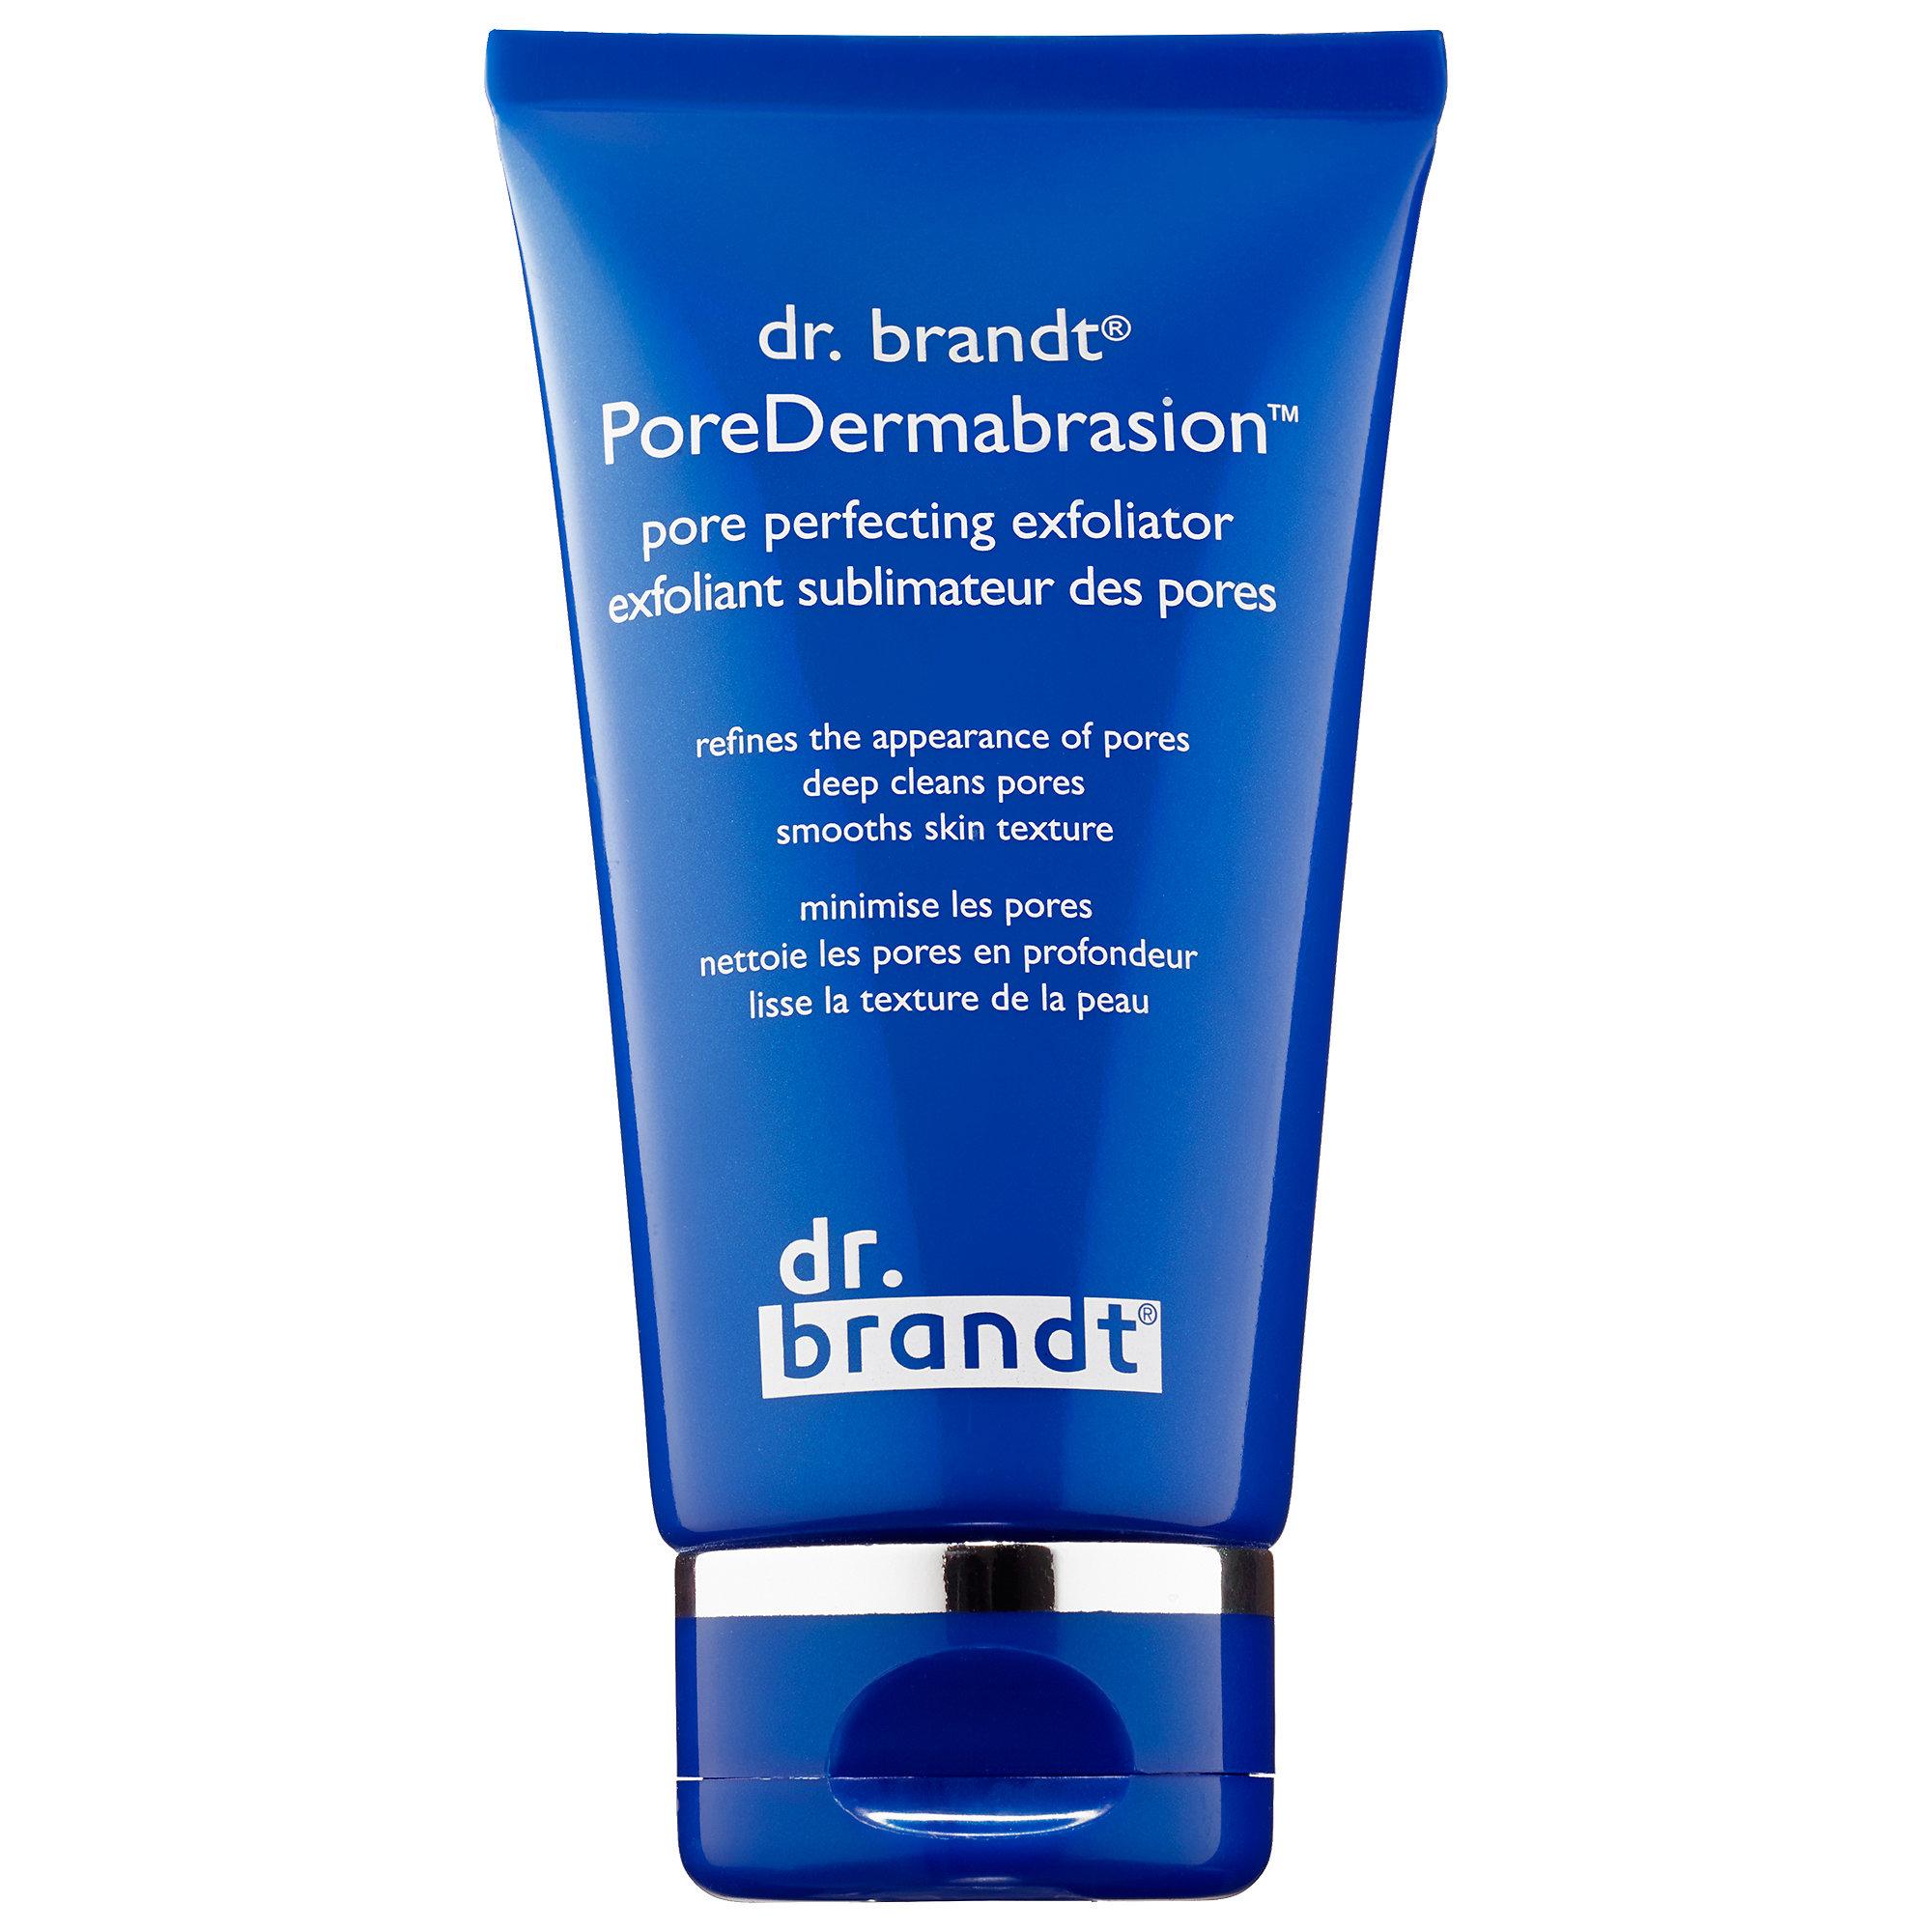 Dr. Brandt - PoreDermabrasion™ Pore Perfecting Exfoliator